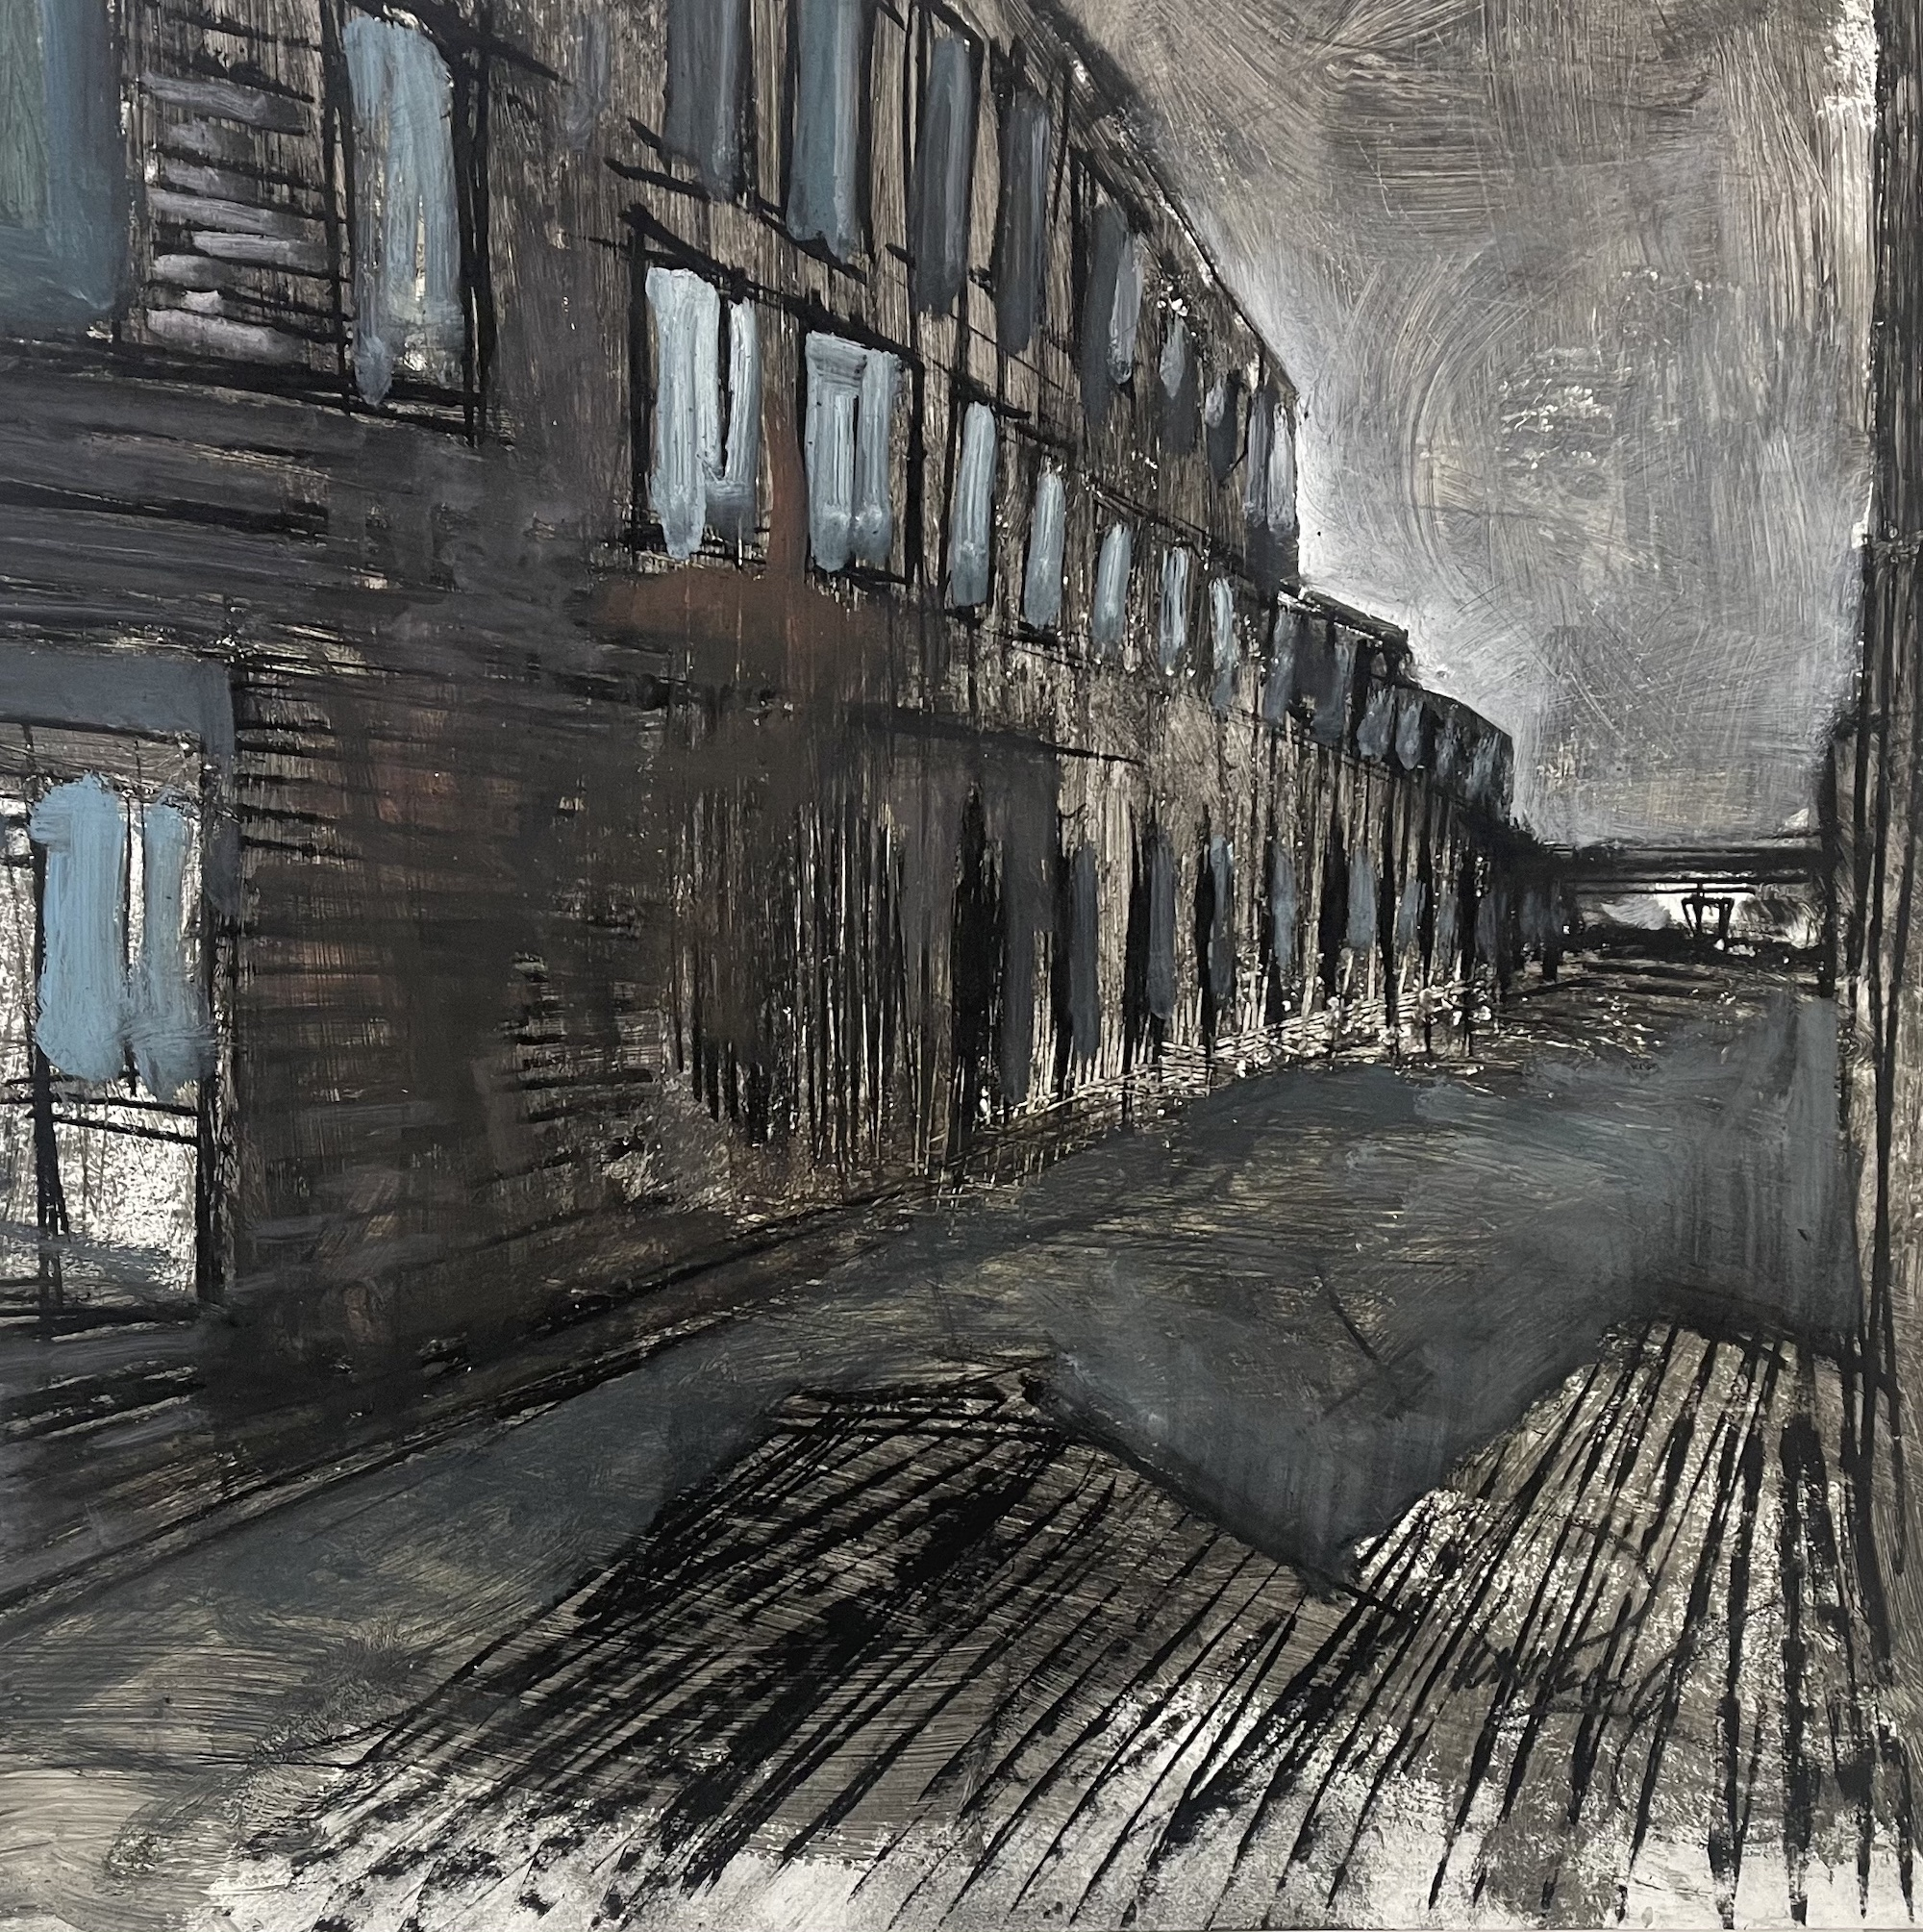 Alleyway (Phoenix Works)